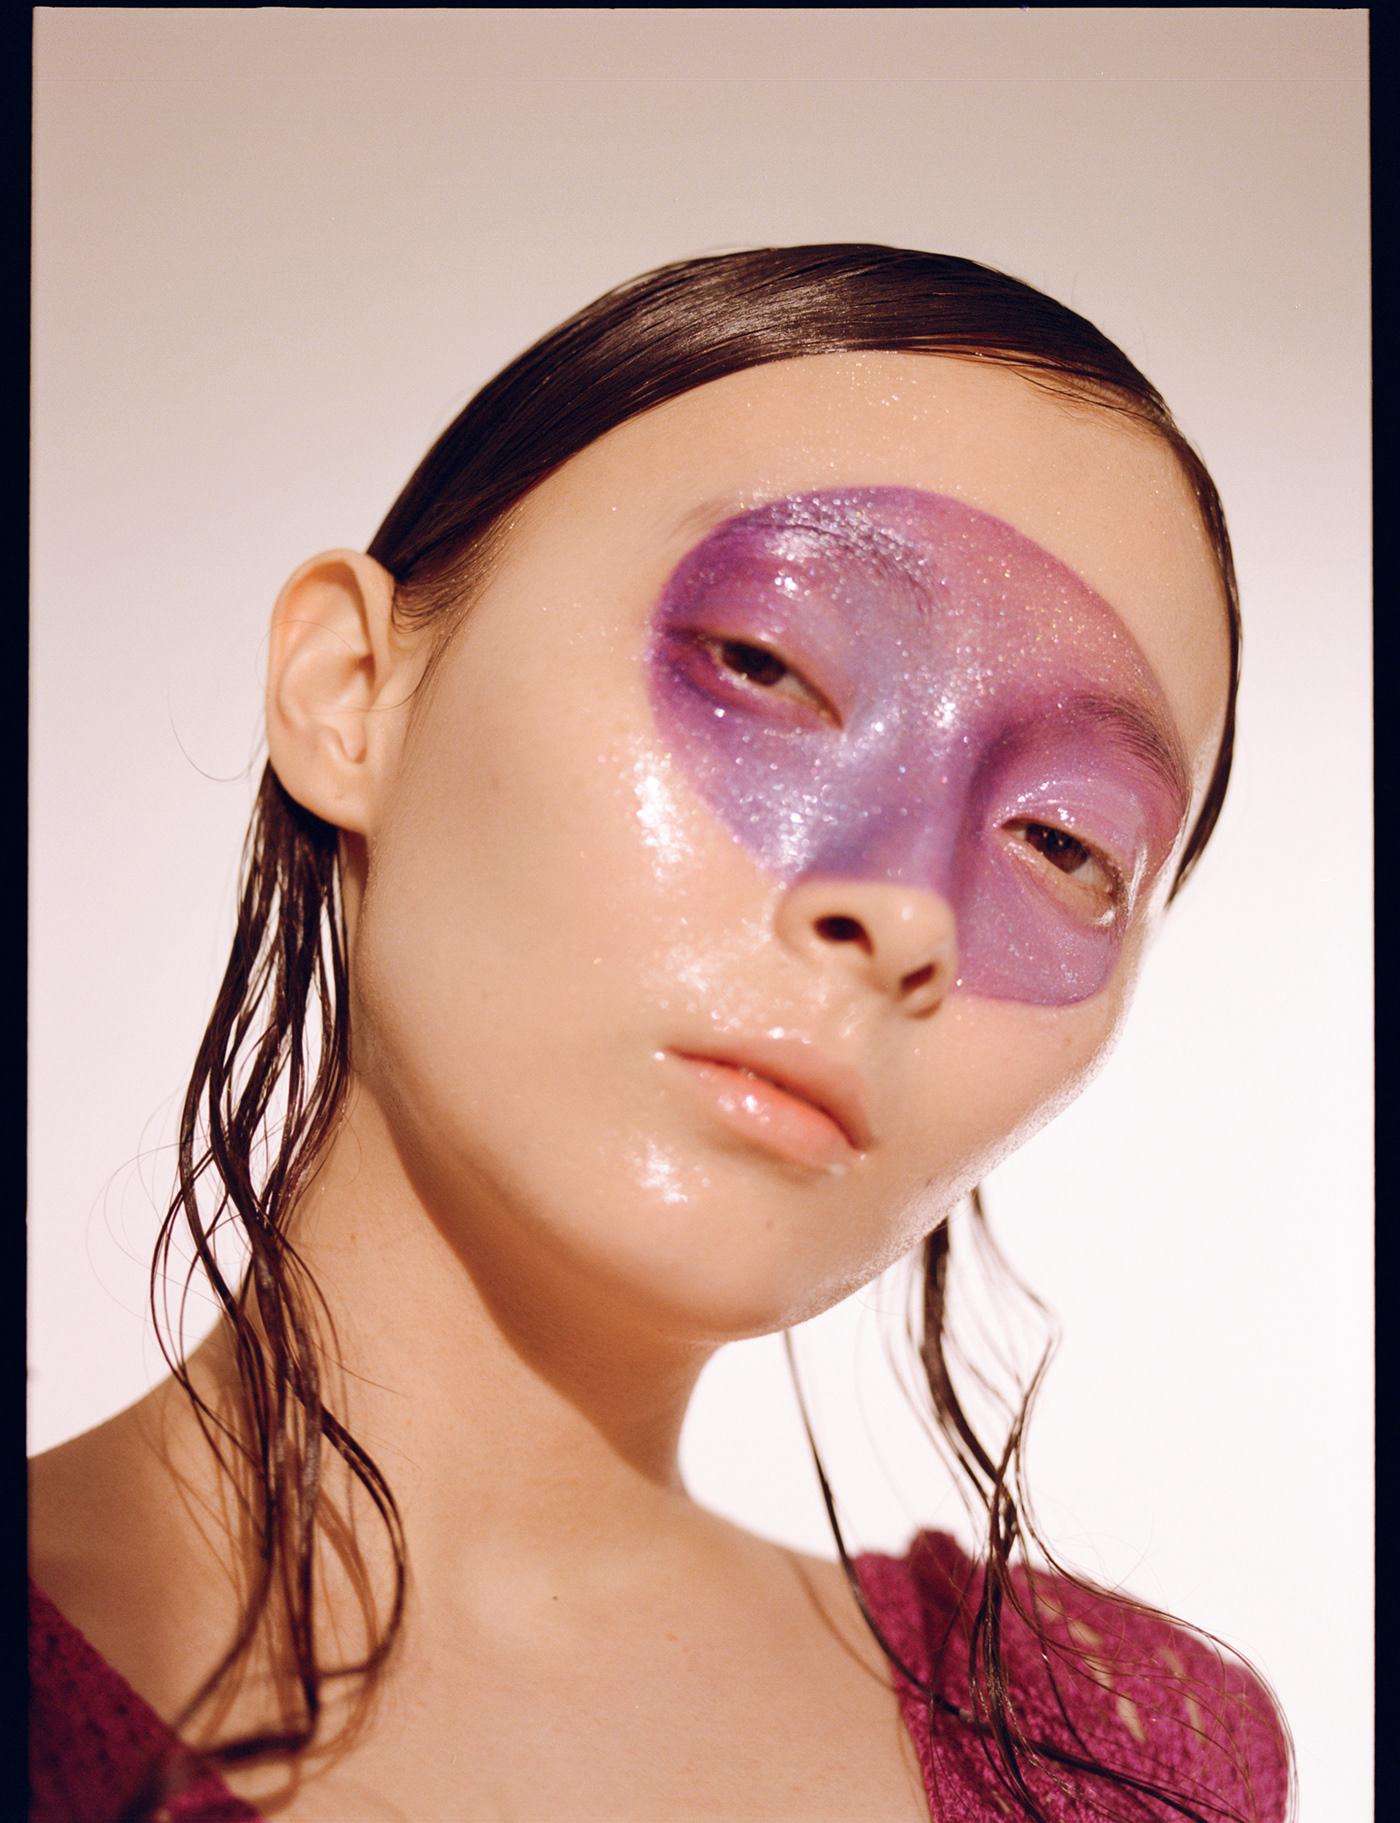 beauty beauty make up BEAUTY PHOTOGRAPHER FASHION PHOTOGRAPHER fashion shooting film photography Mamiya portrait purple studio light